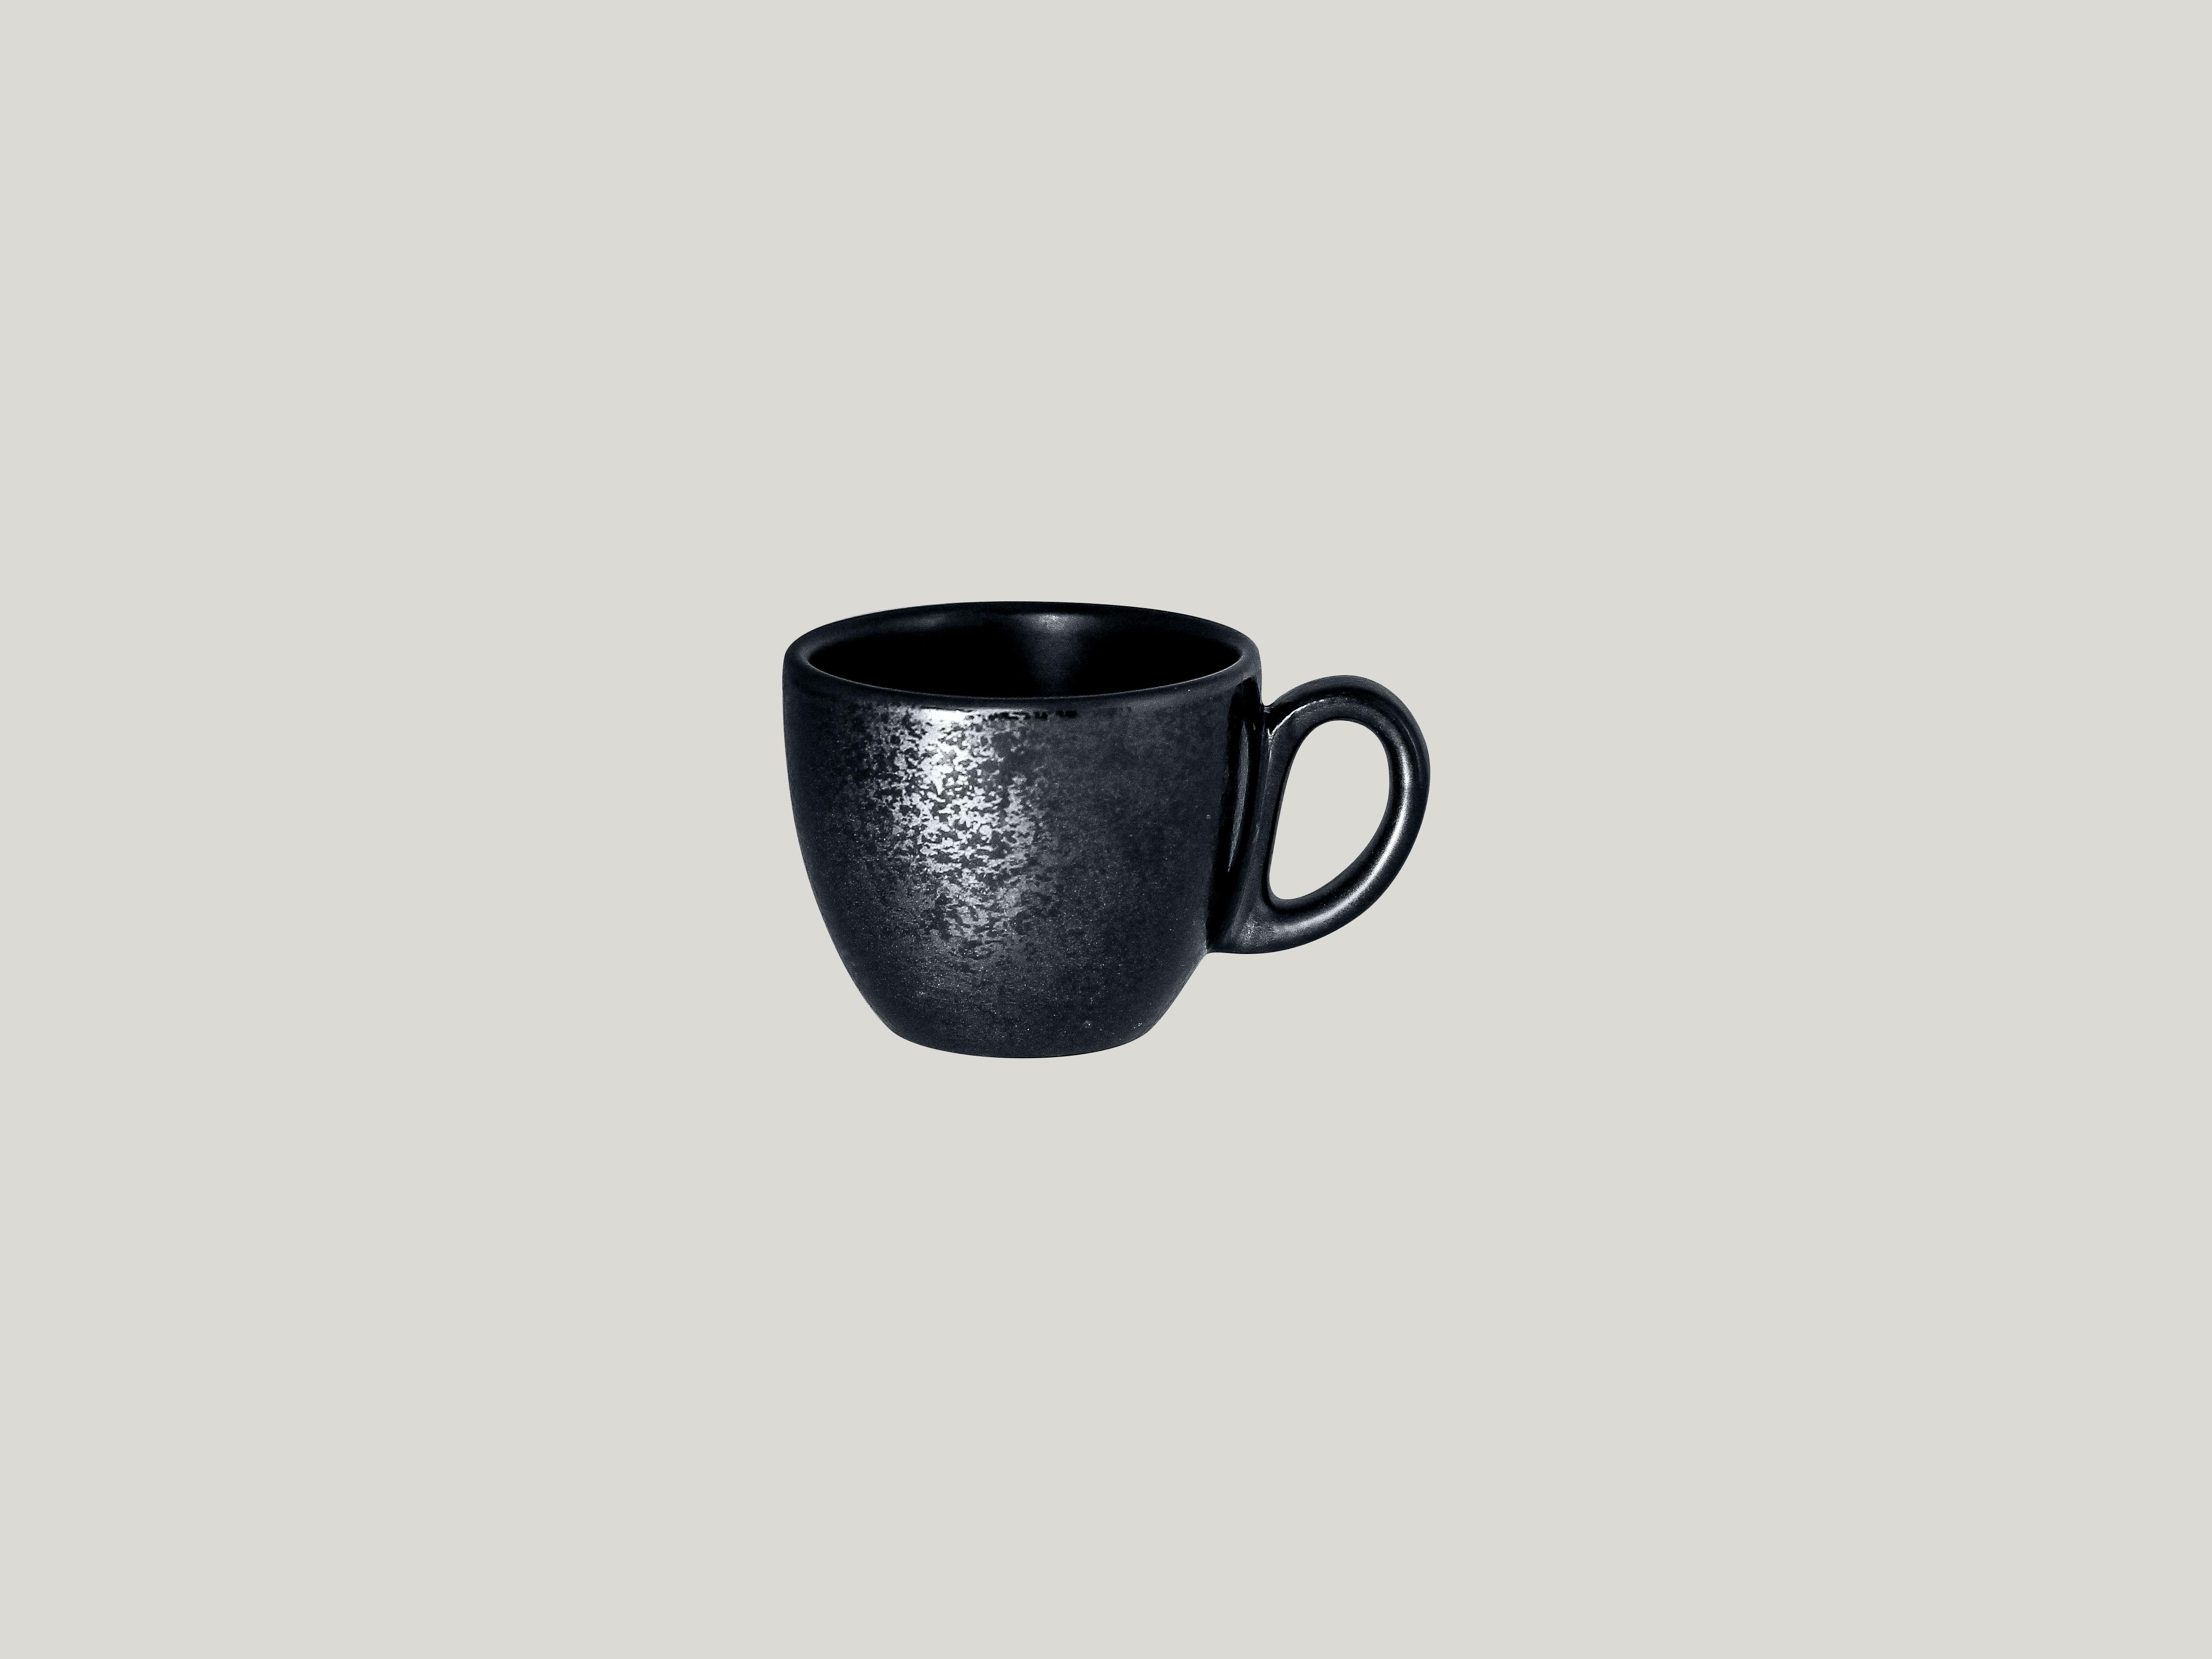 Karbon Fusion Espresso Tasse (12stck)